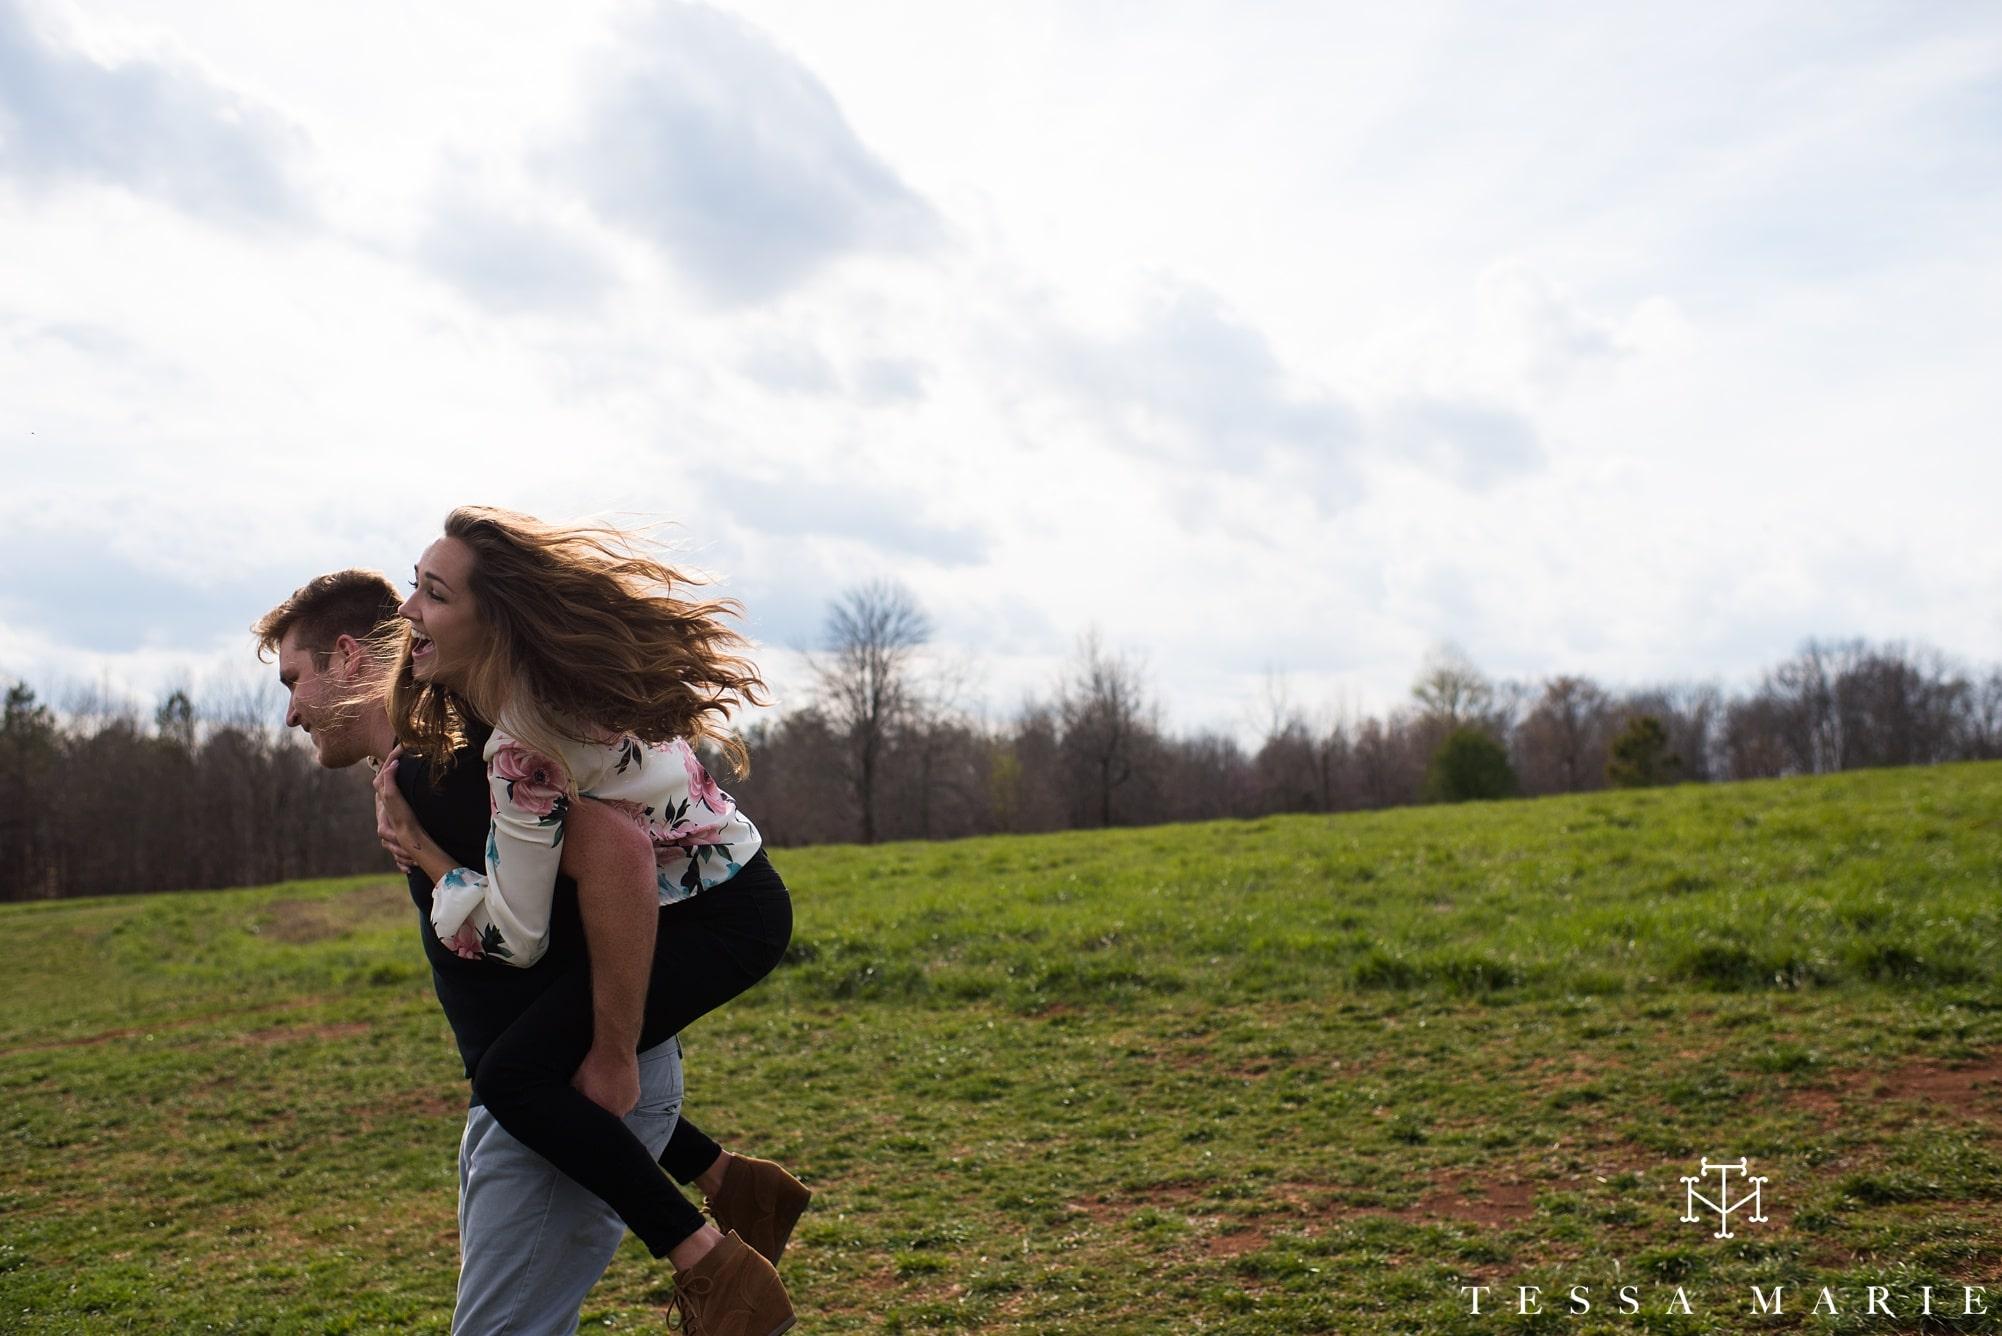 tessa_marie_studios_tessa_marie_weddings_proposal_atlanta_engagement_pictures_0062